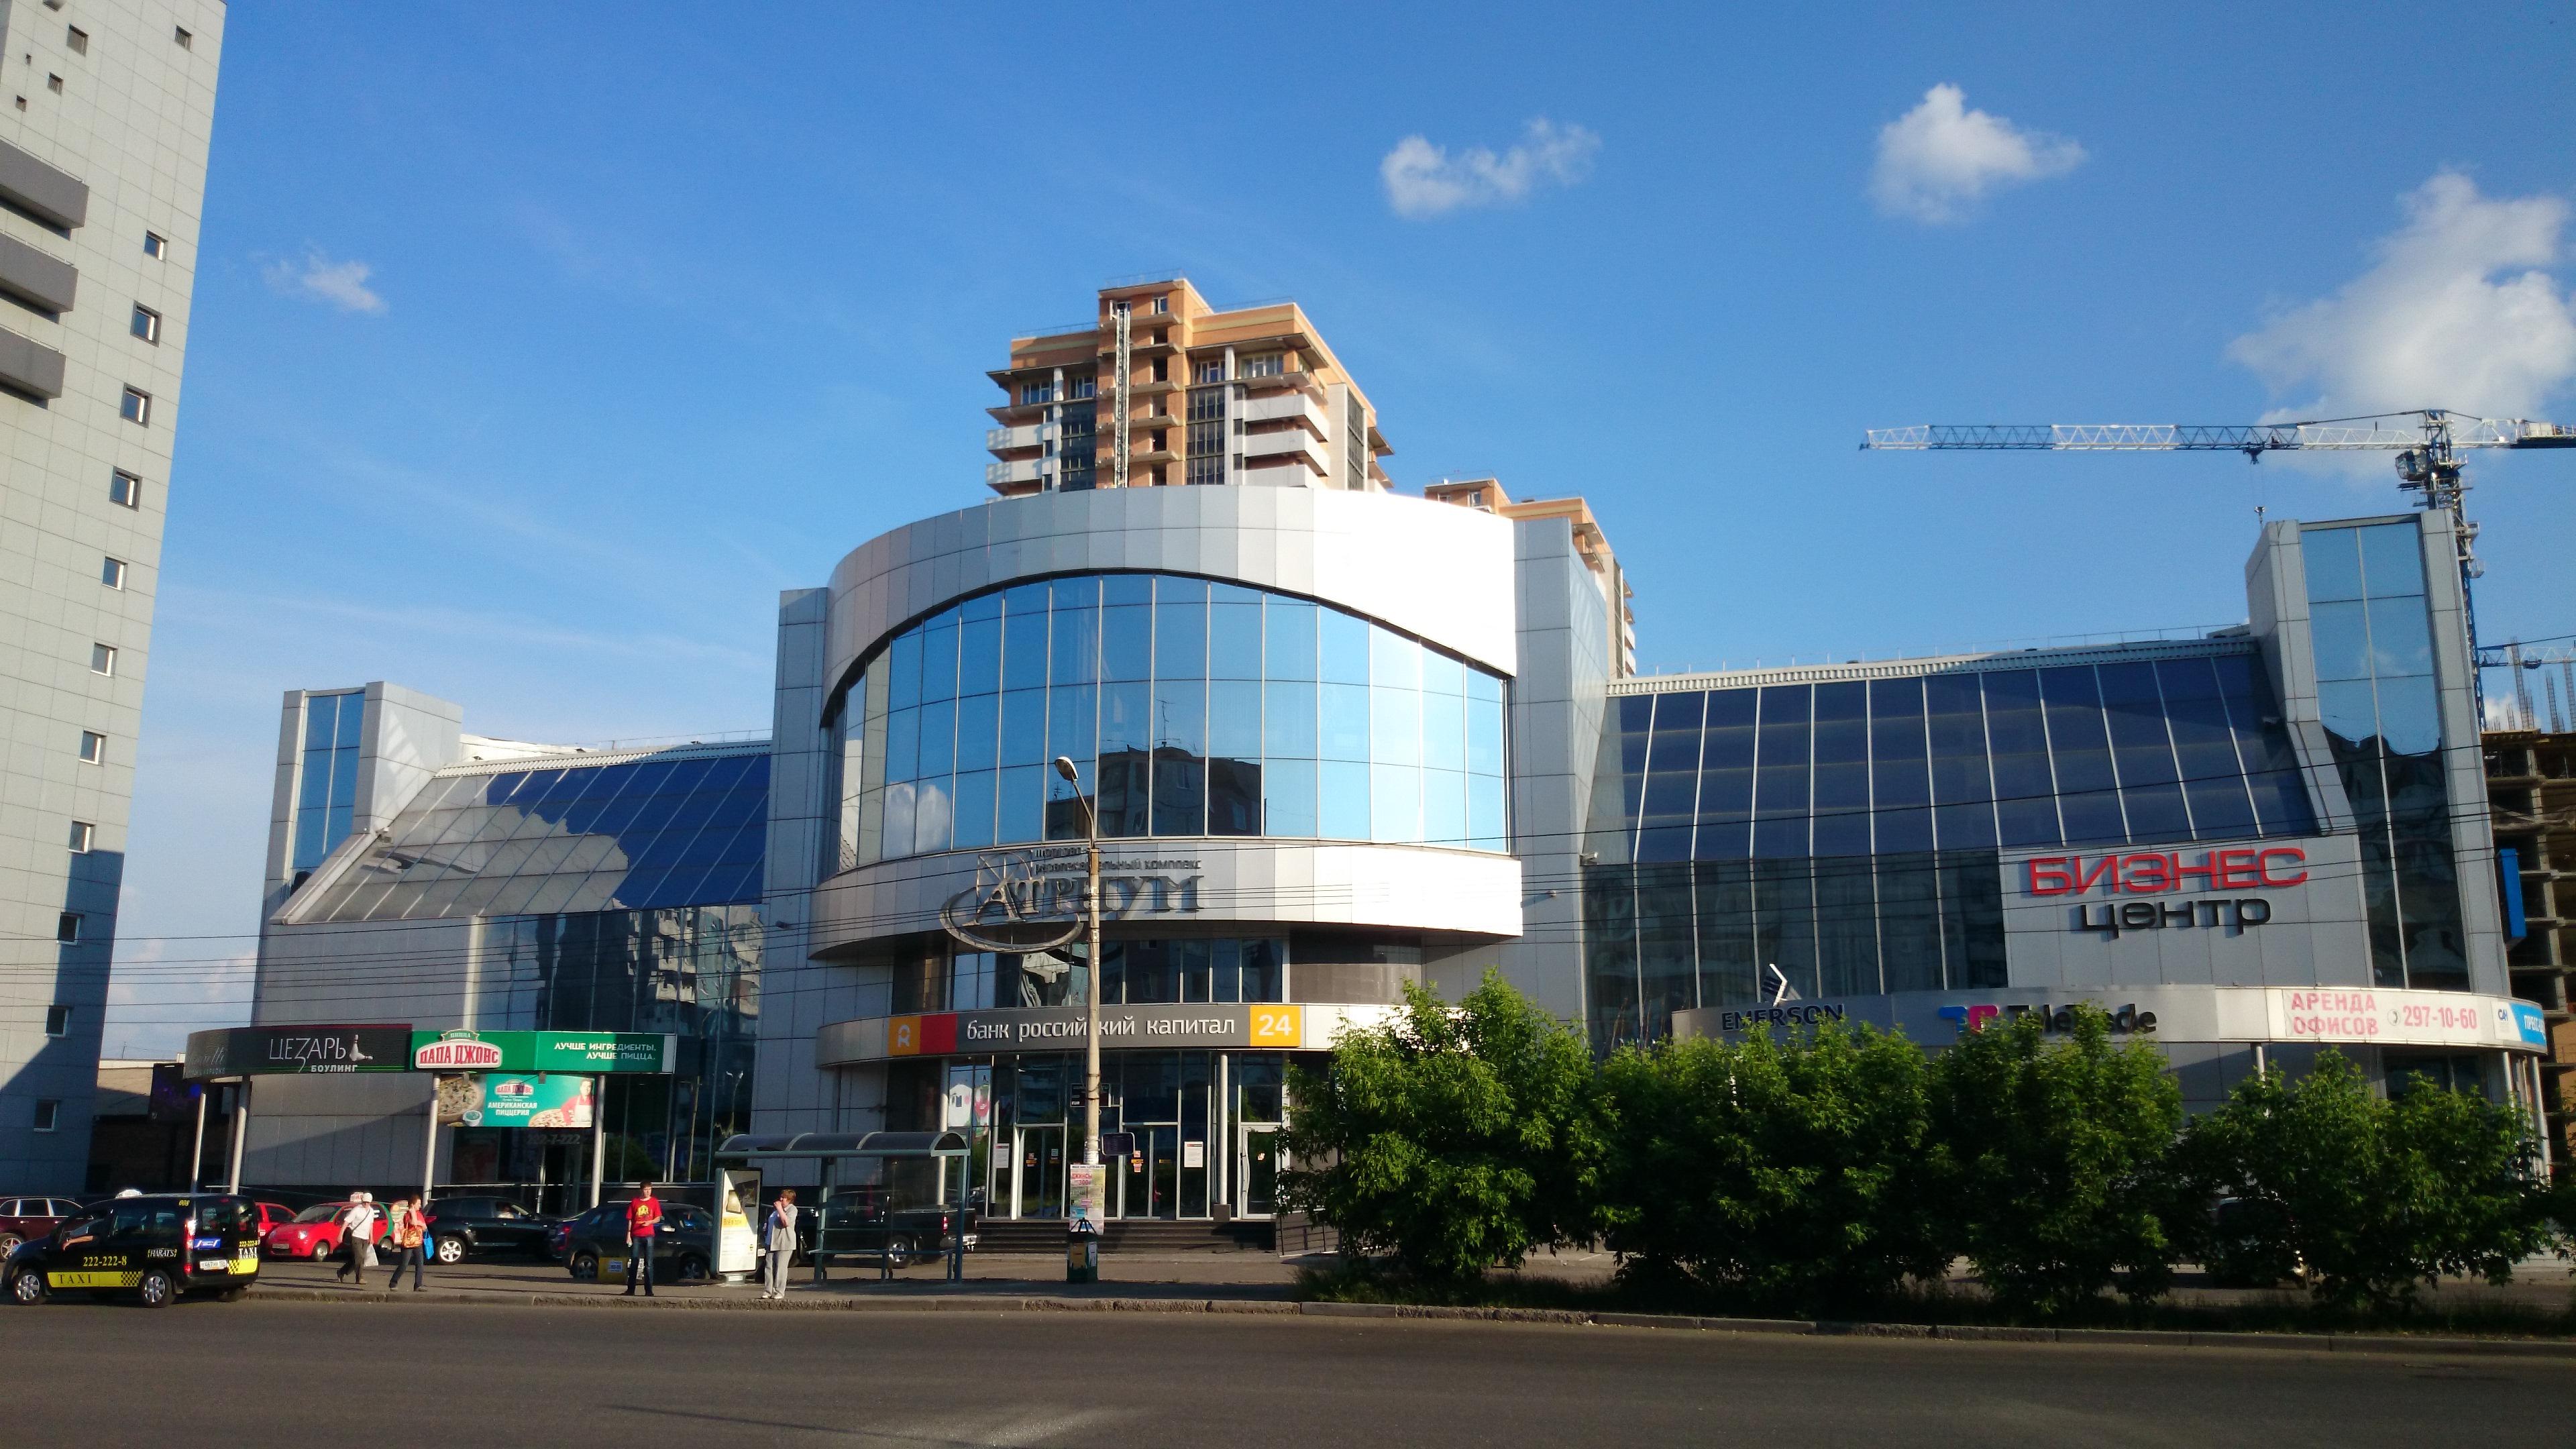 Красноярск ТРК Атриум и др.орг. 27.06.2014 года